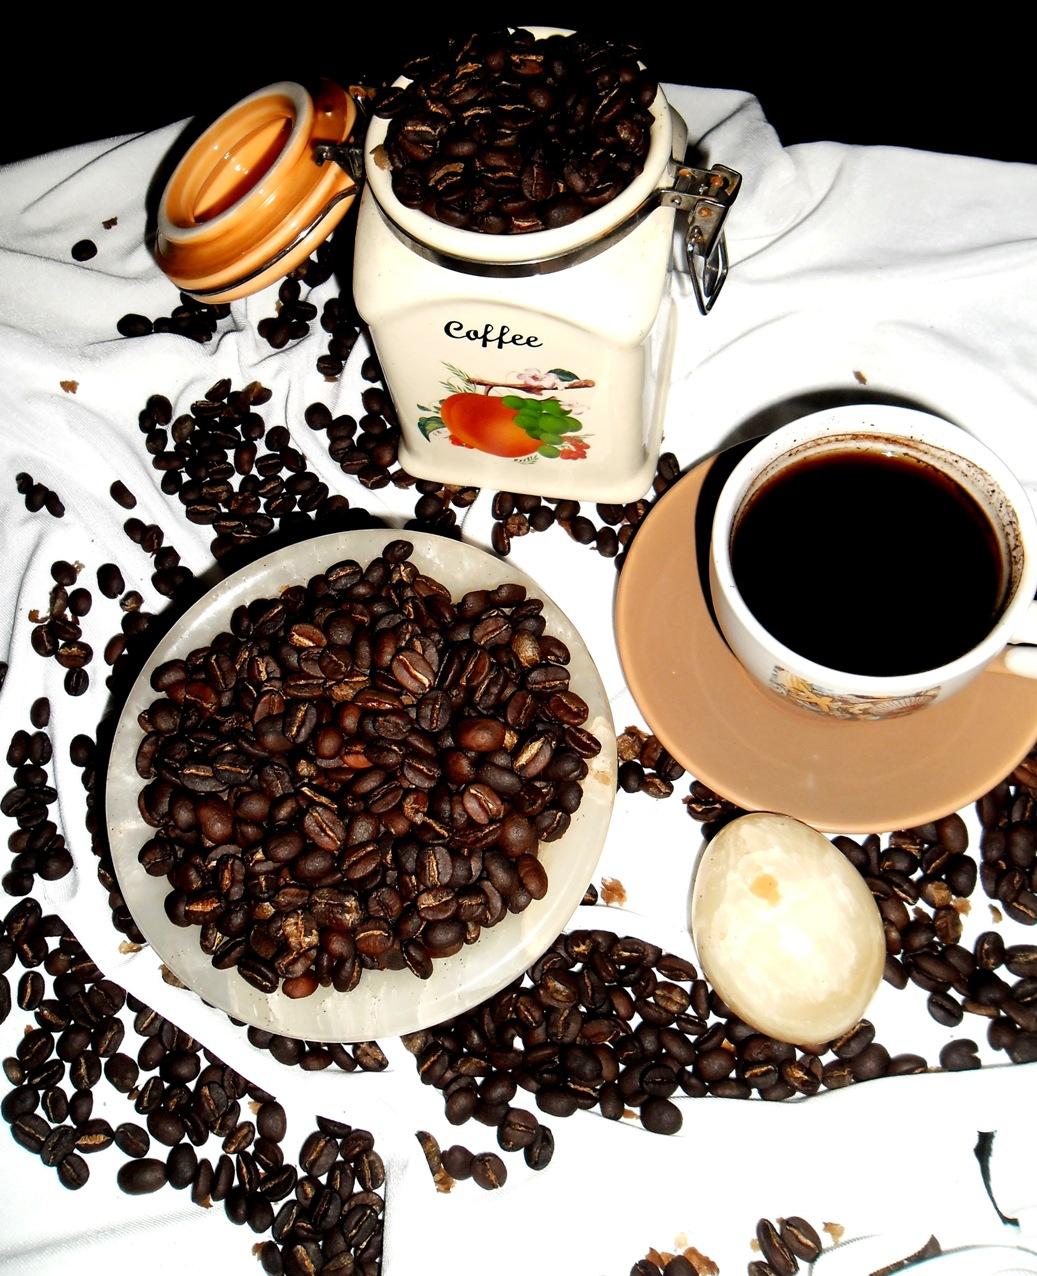 Drinking Kopi Luwak 'poop coffee' in Indonesia - Matador ...  Kopi Luwak Coffee Plantations